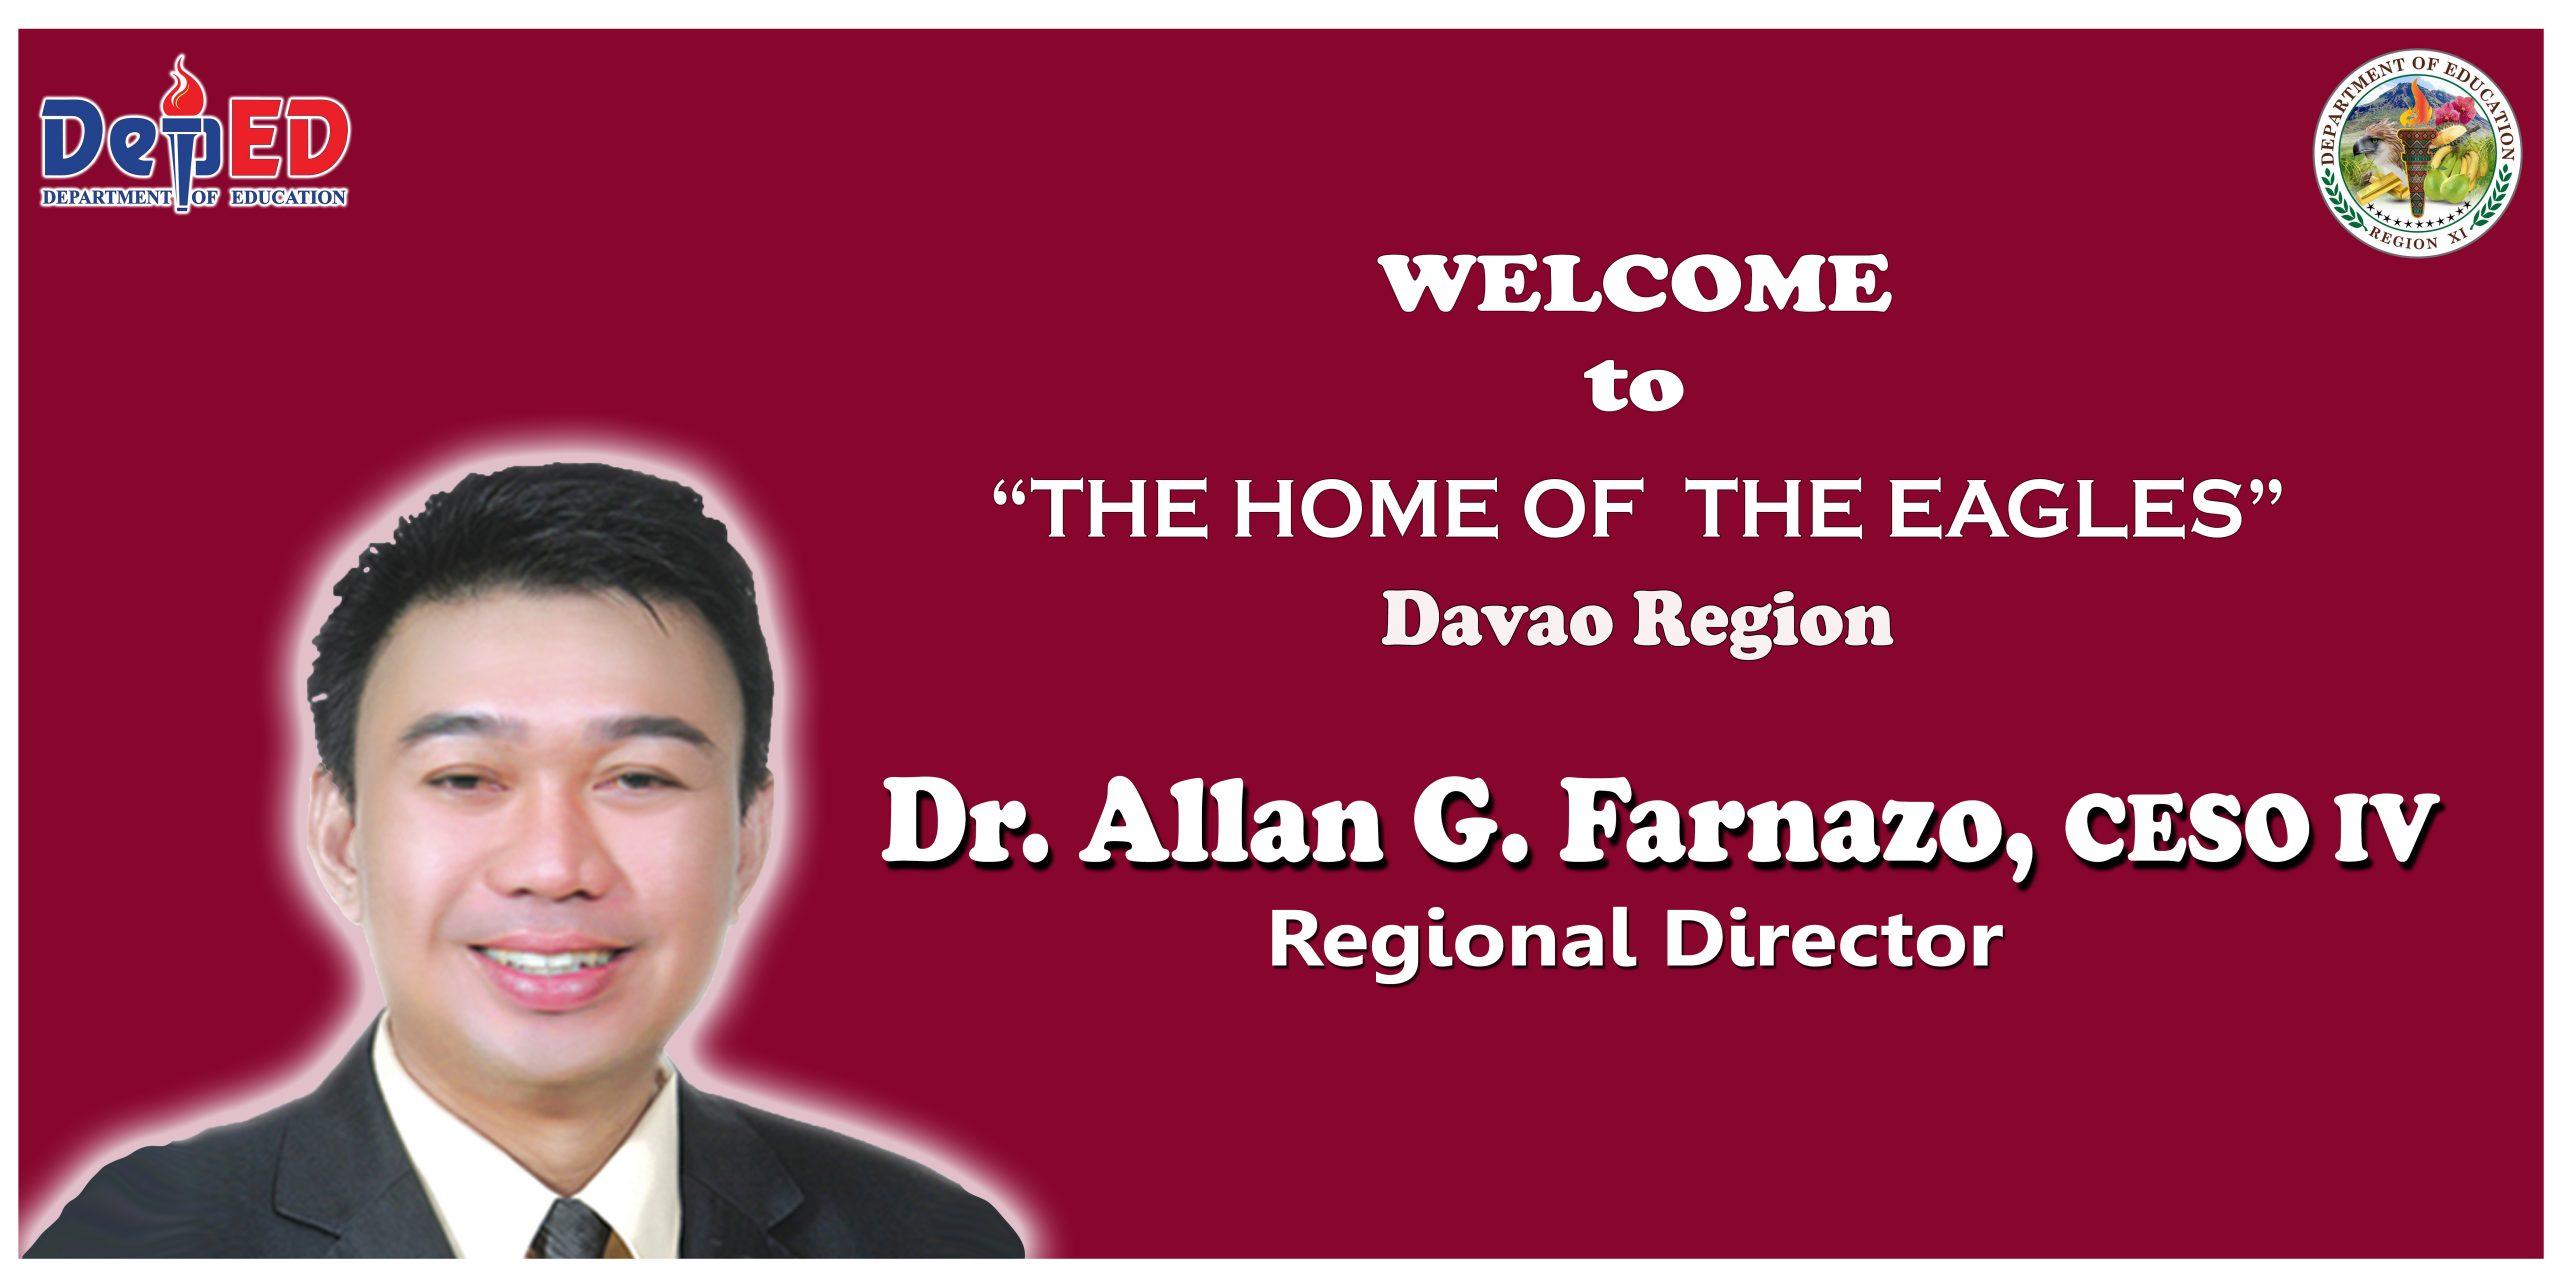 Welcome RD Allan!